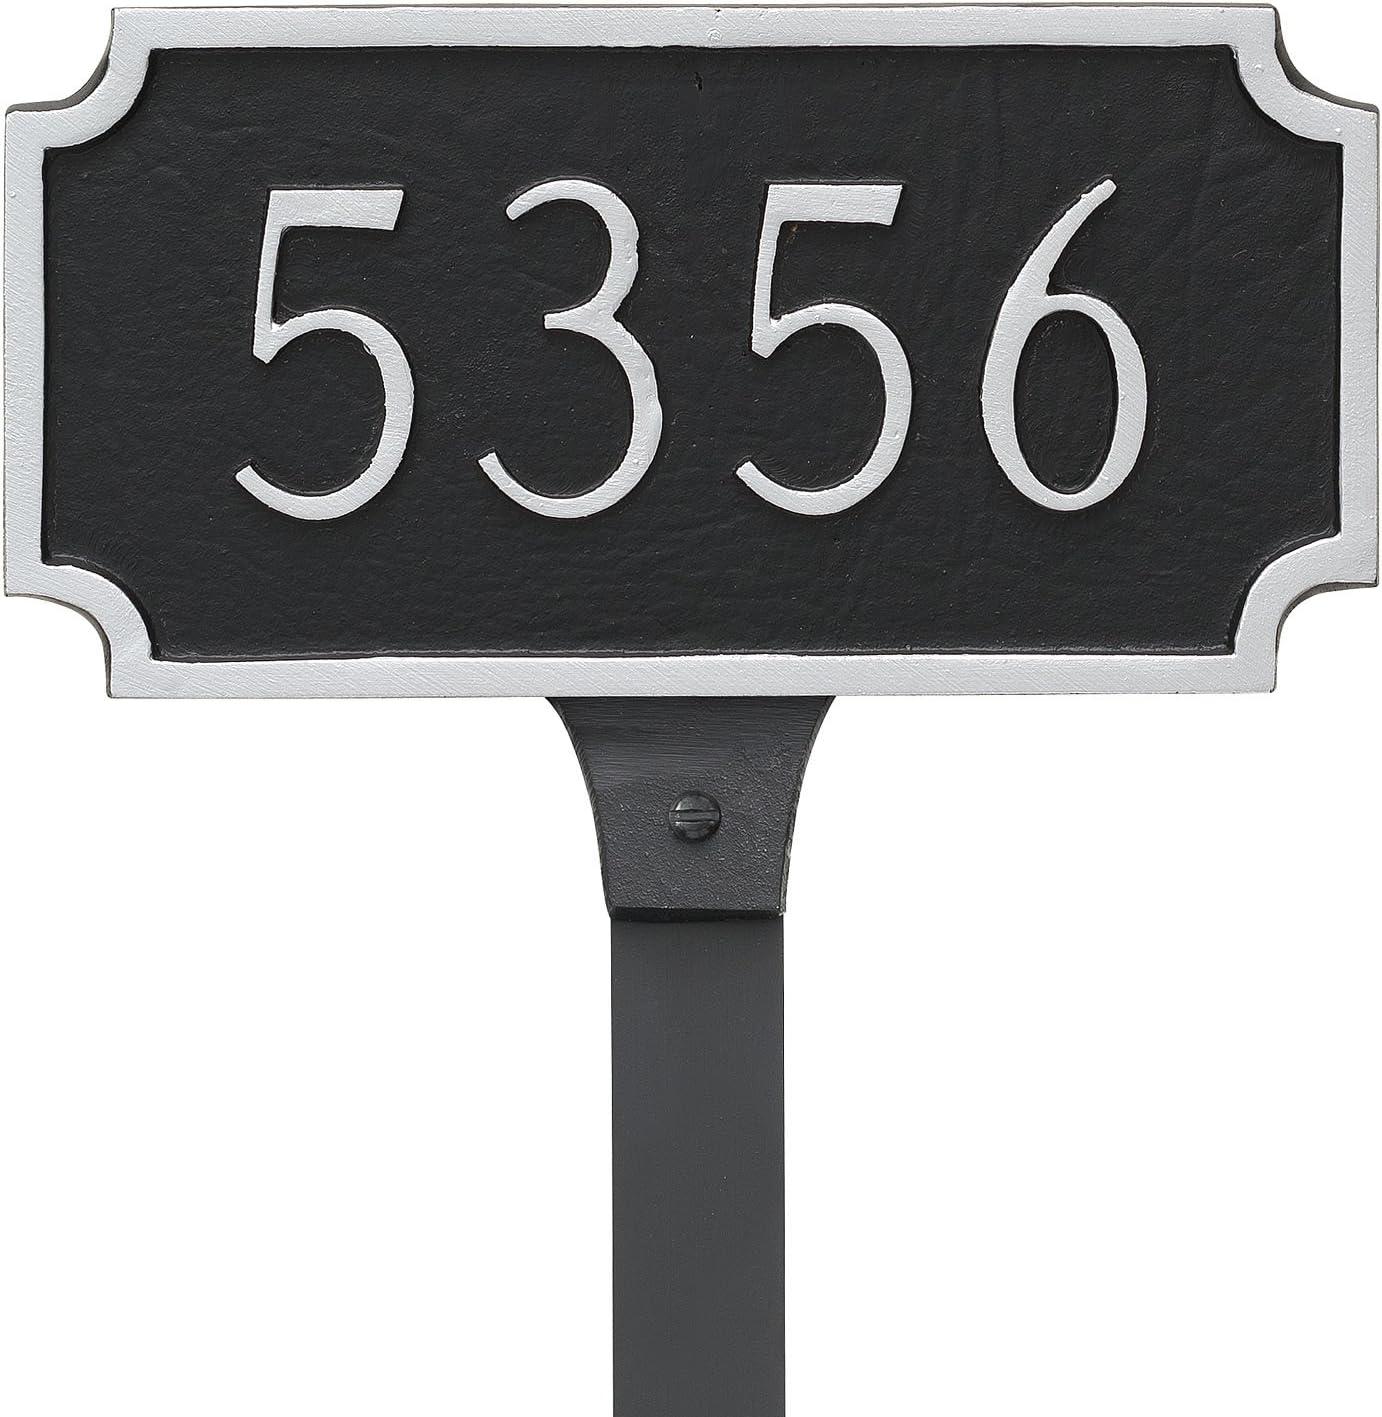 Montague Metal Princeton Petite Address St Plaque Sign with Lawn Max 52% 40% OFF Cheap Sale OFF